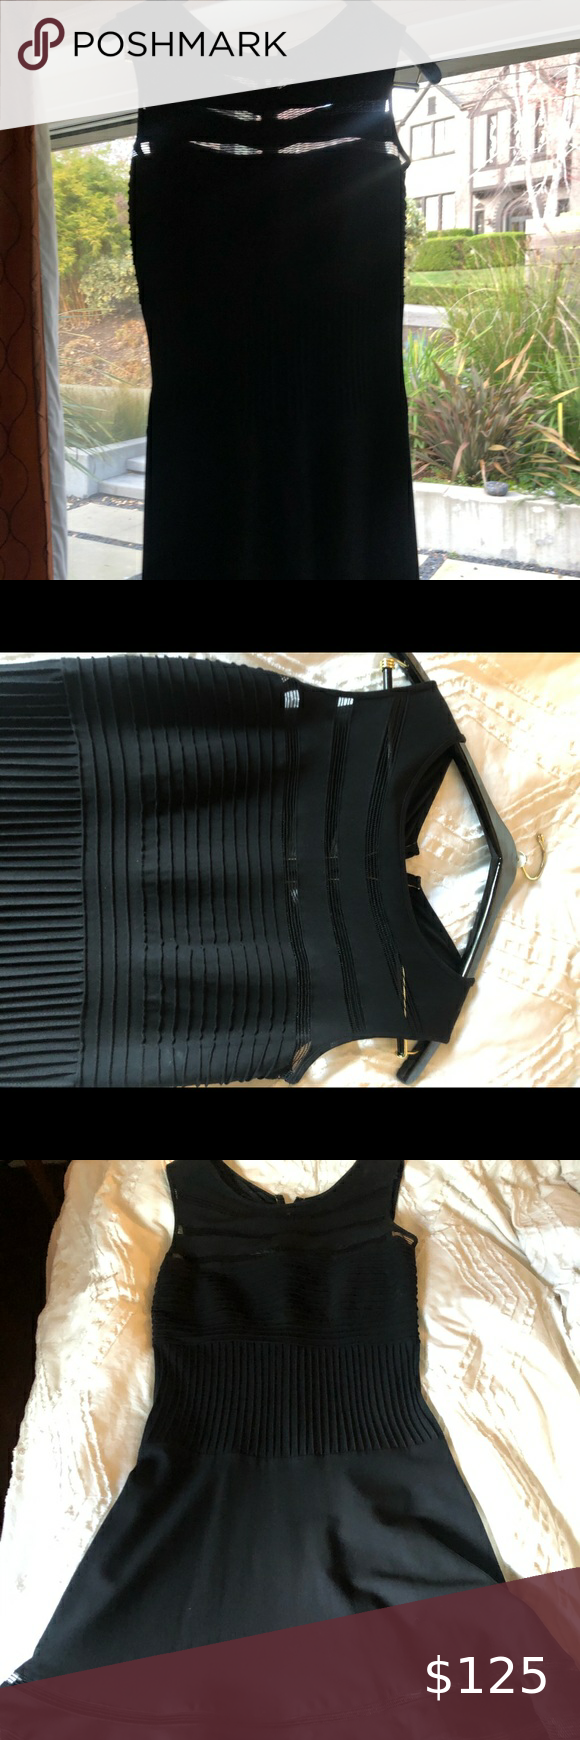 Tadashi Shoji Black Fitted Dress Used Once Fitted Black Dress Fitted Dress Tadashi Shoji Dresses [ 1740 x 580 Pixel ]